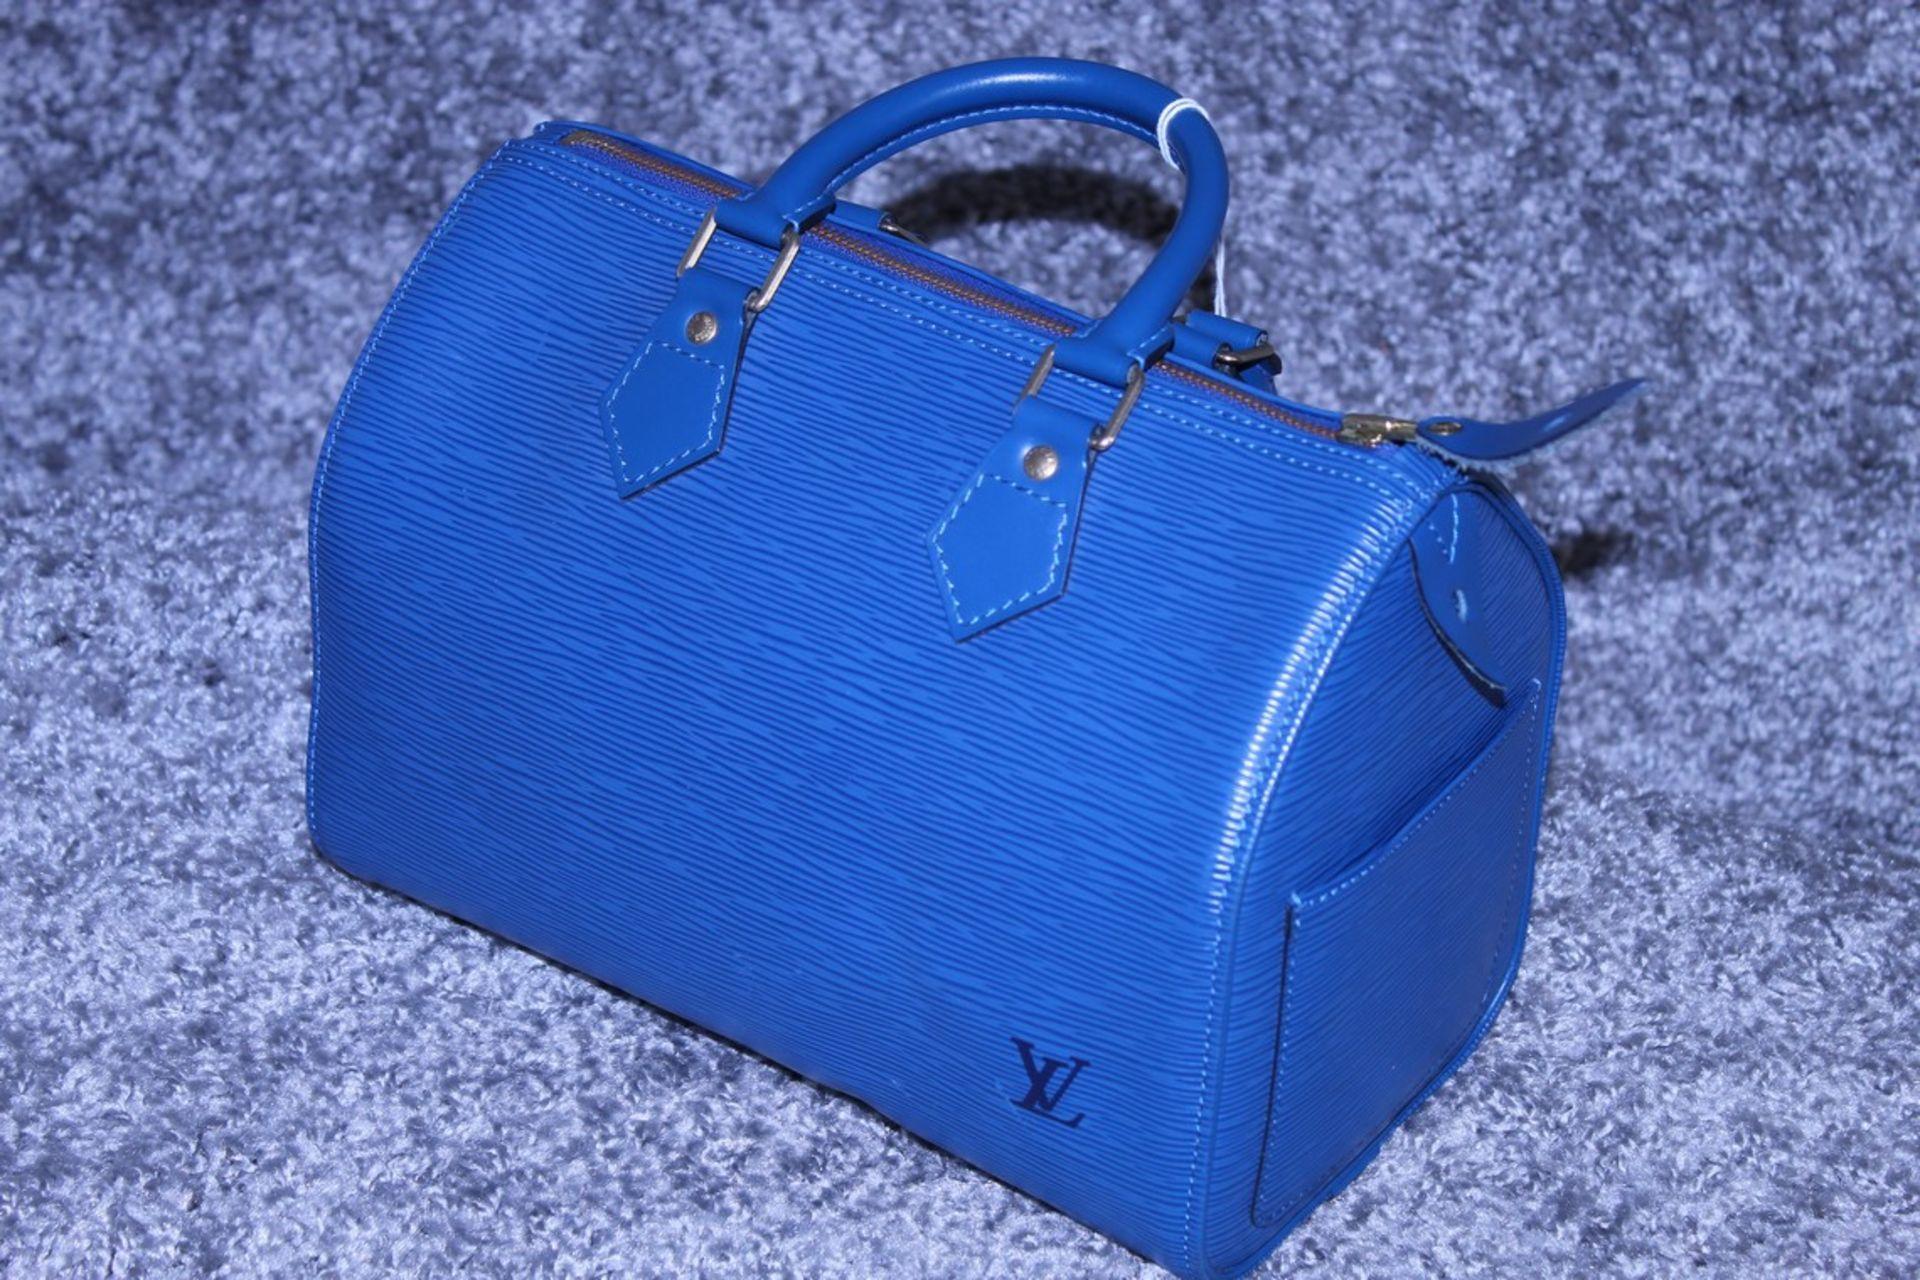 RRP £1,000 Louis Vuitton Speedy 25 Handbag, Blue Epi Calf Leather, 27X19X15Cm (Production Code - Image 3 of 5